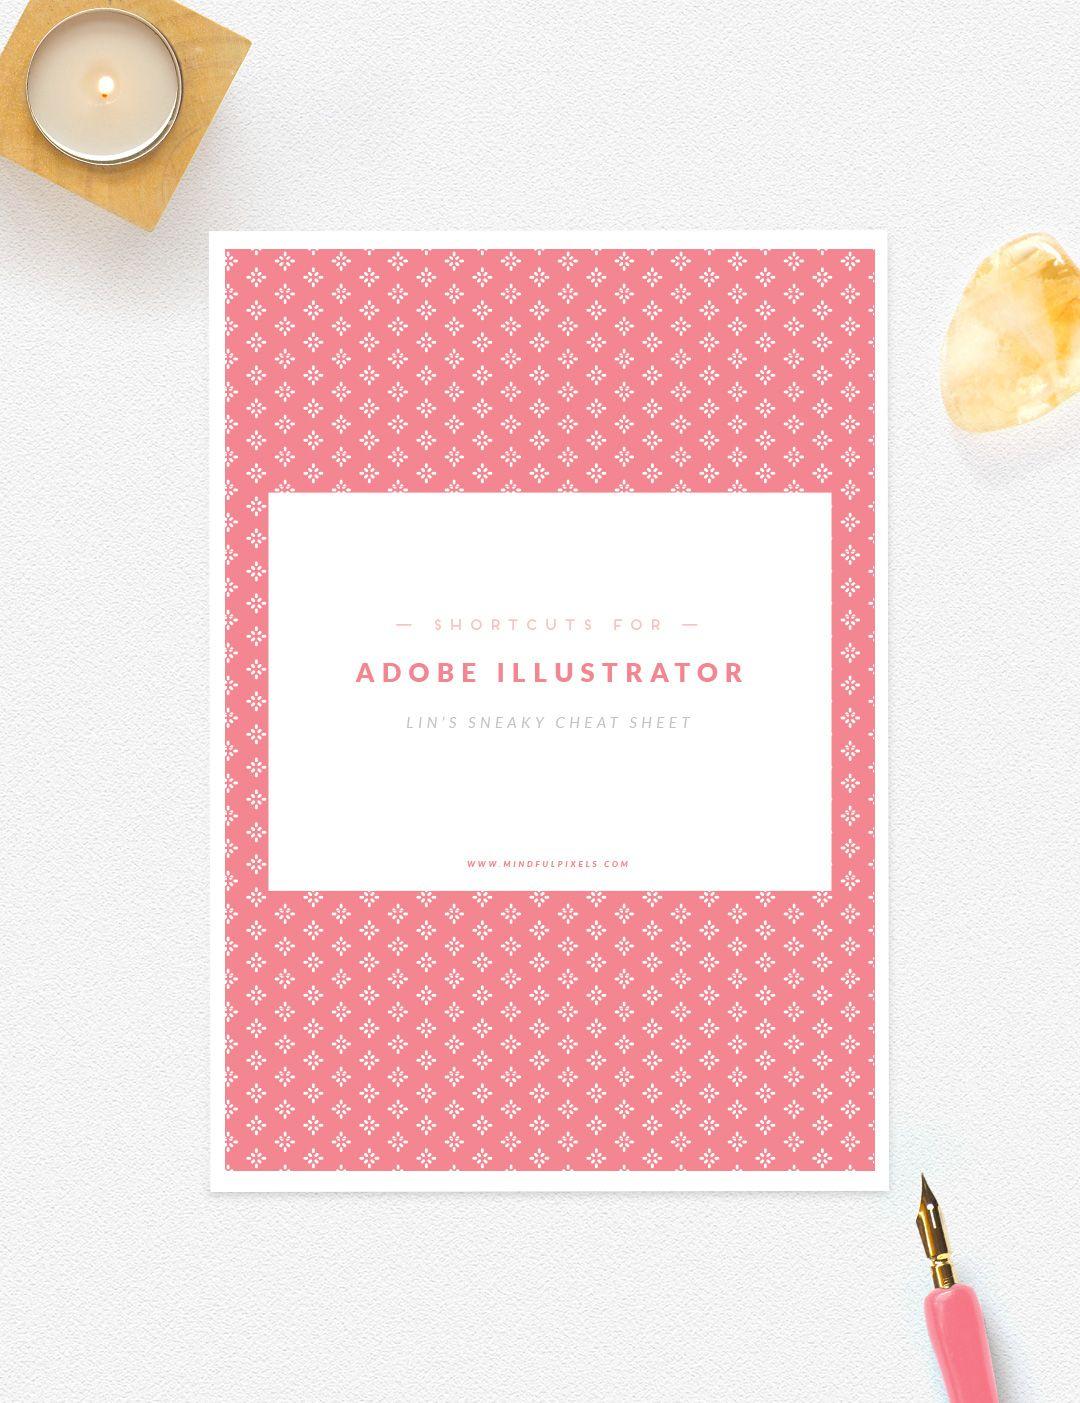 Create Worksheets In Adobe Illustrator